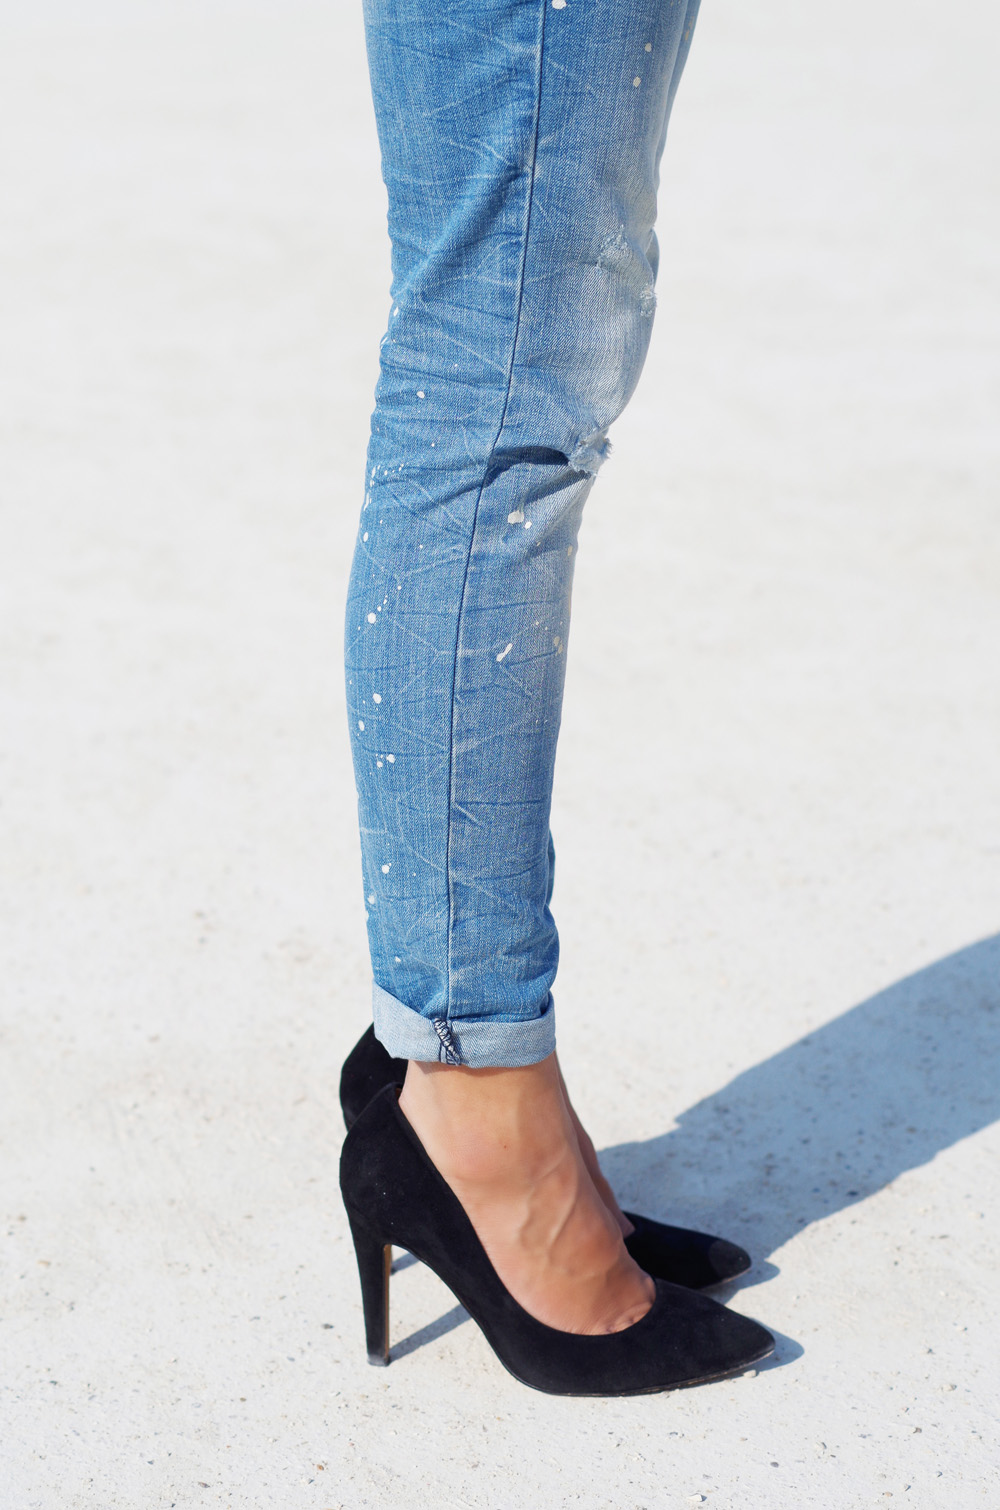 fatimayarie-suede-black-highheels-zara-jeans-fashionblog-imgp9421